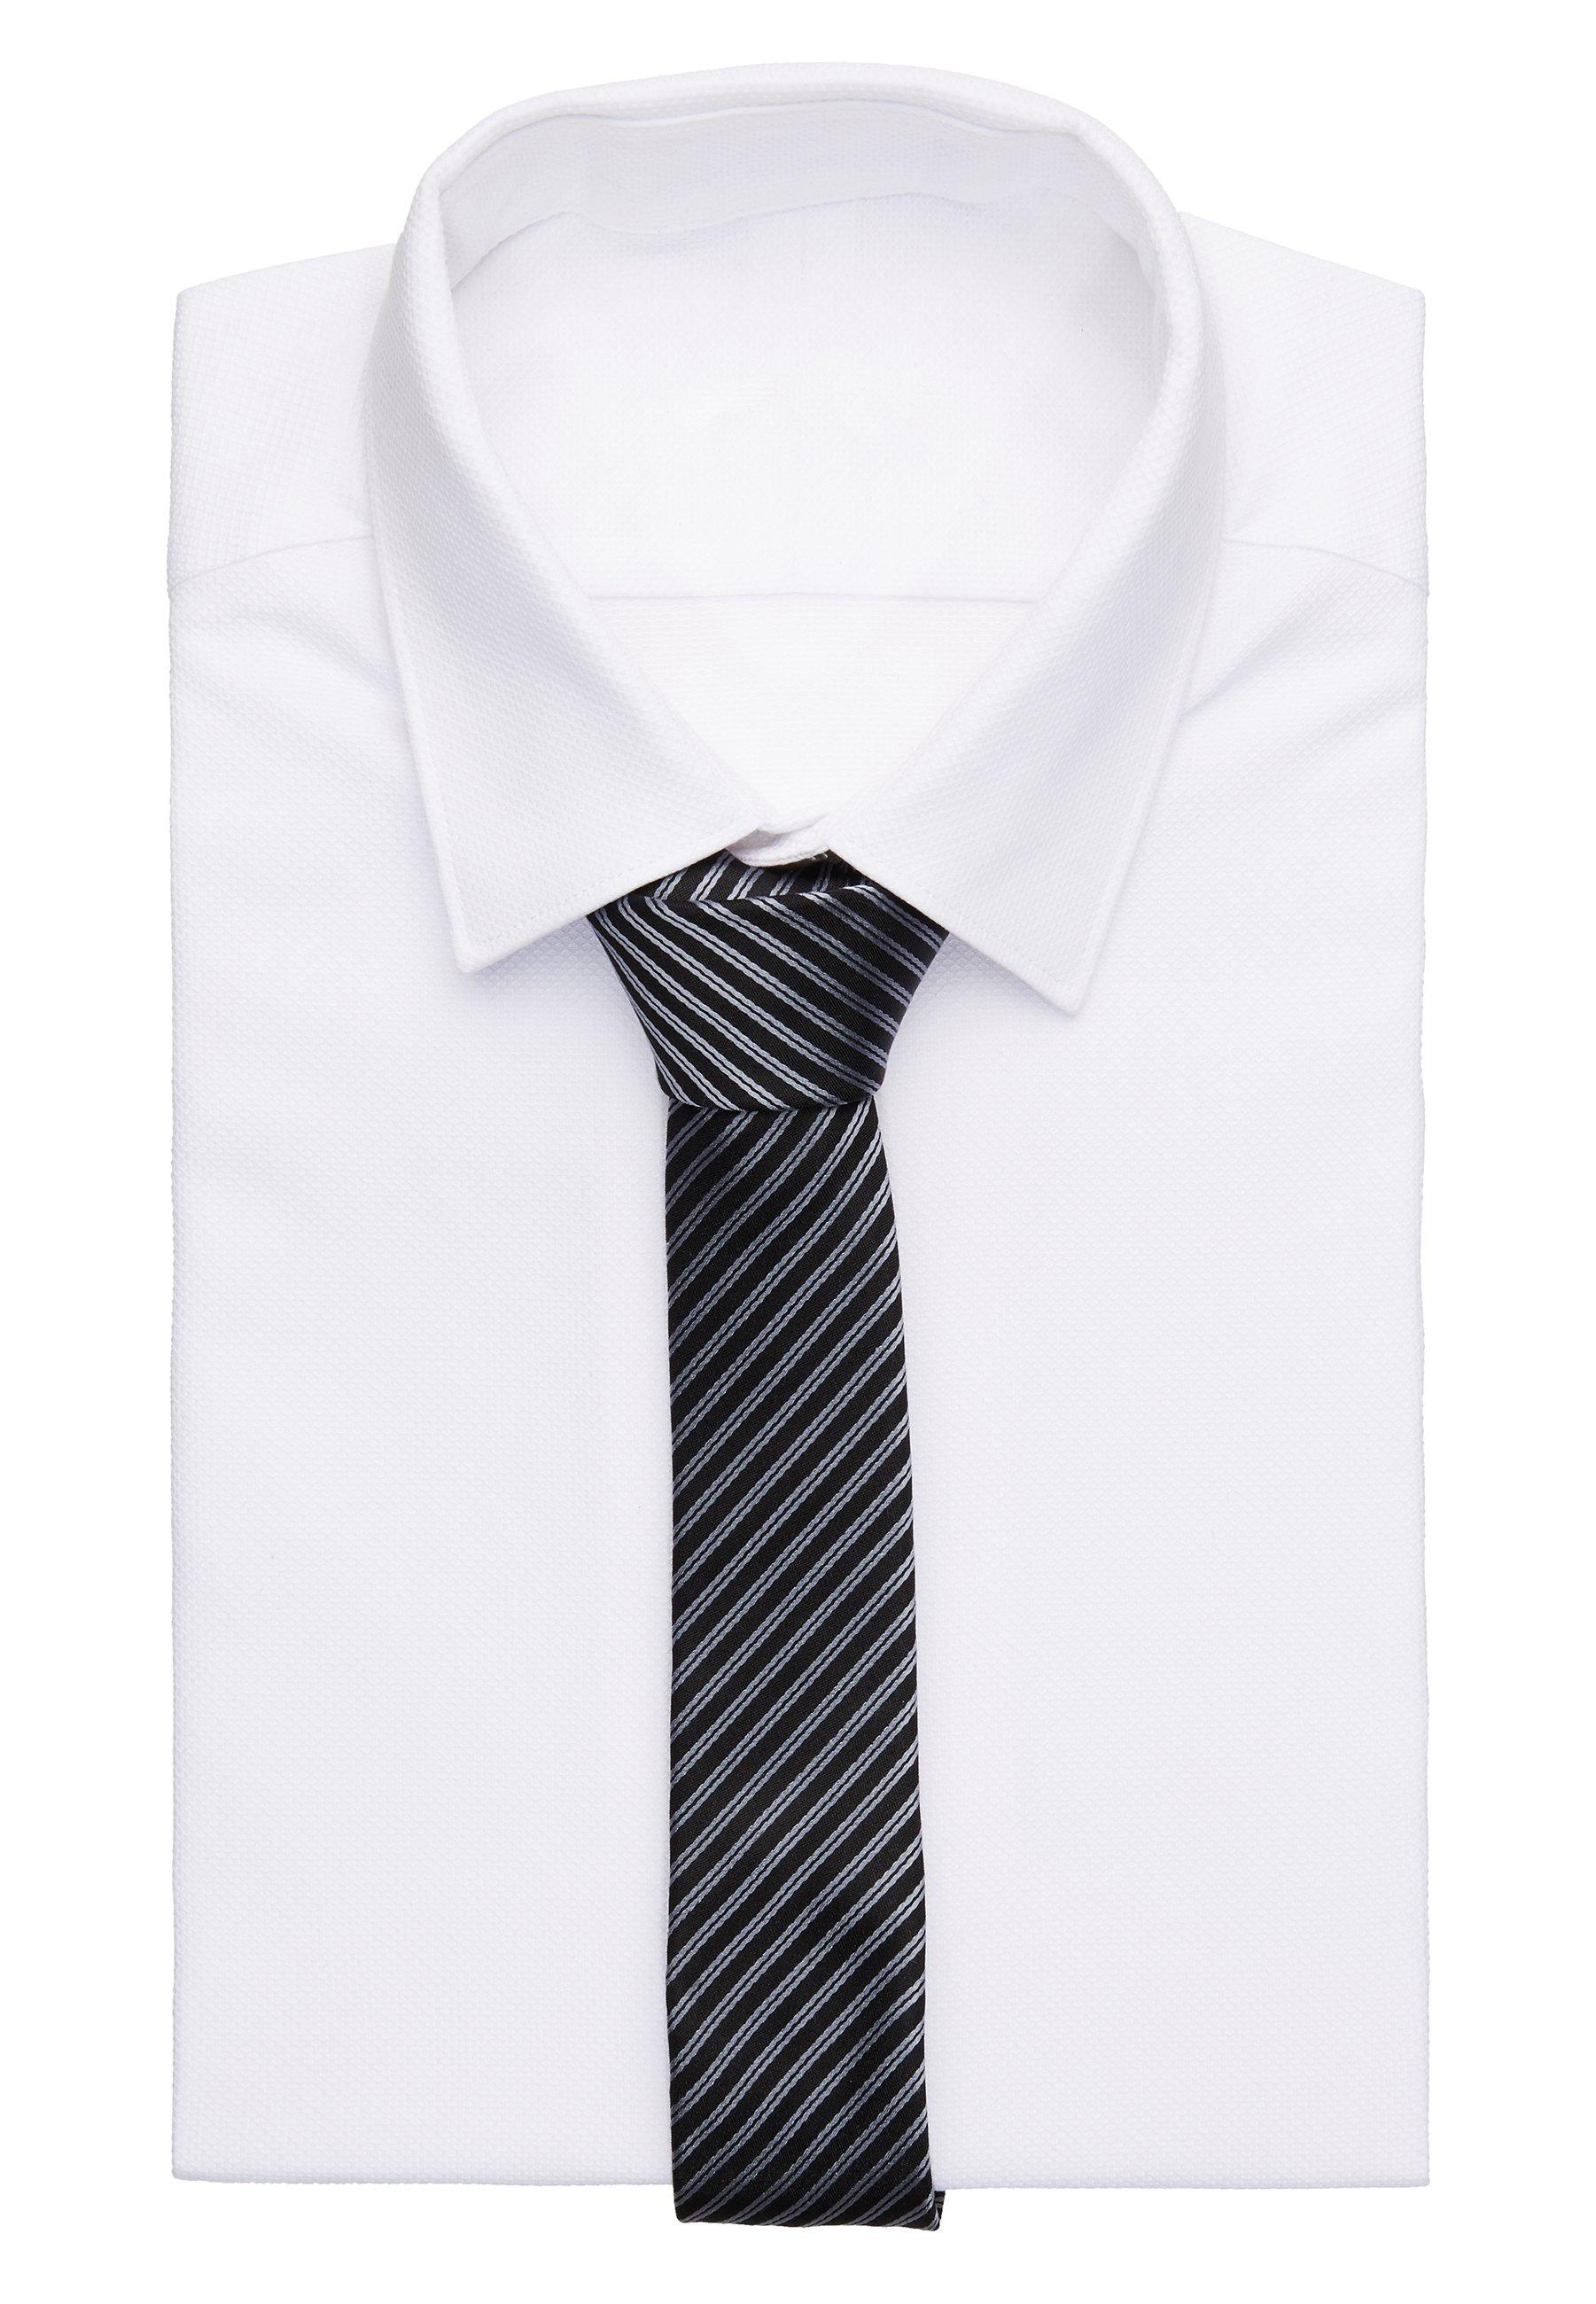 DRYKORN TIE SLIM - Krawatte - black/schwarz - Herrenaccessoires 15M48